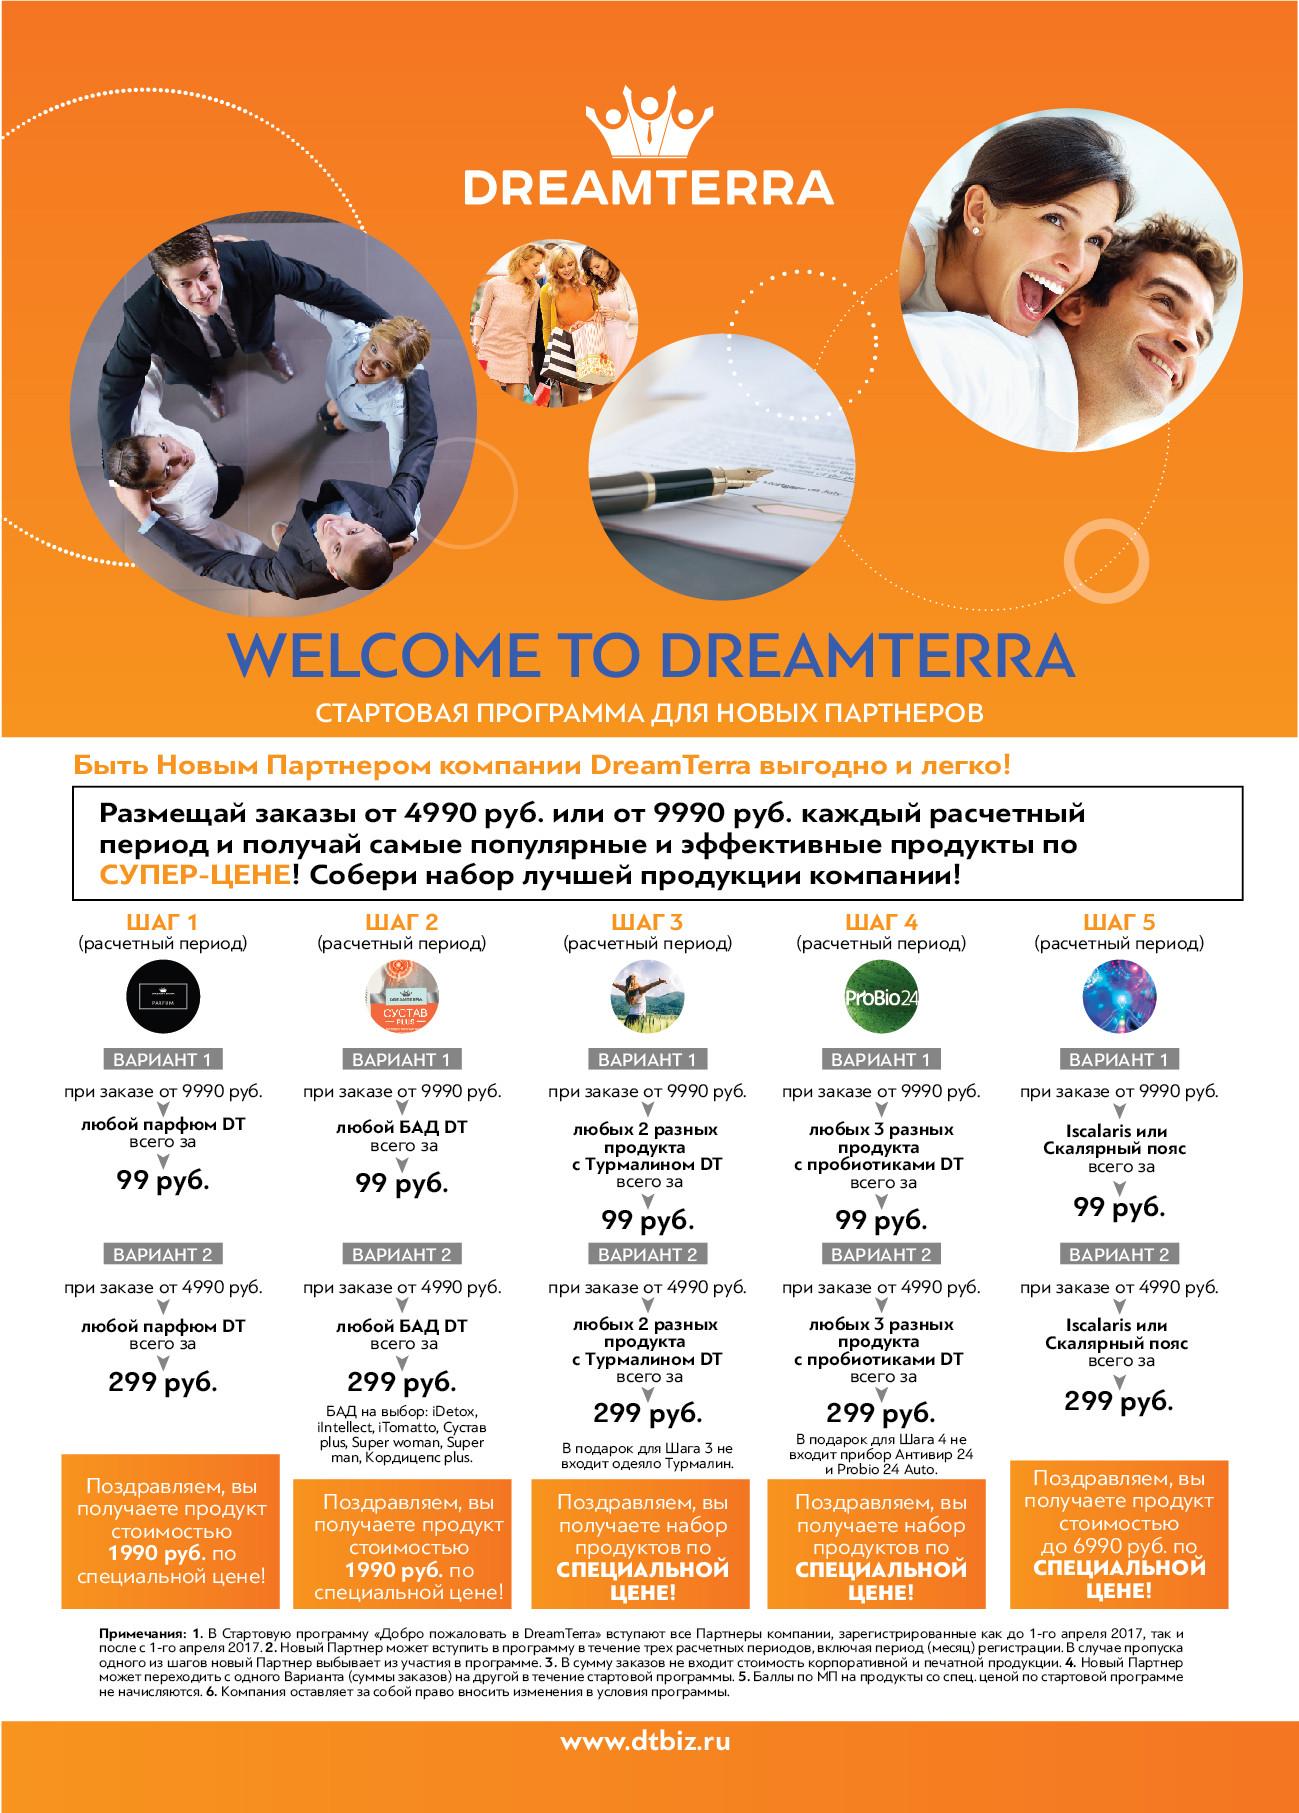 Компания DreamTerra